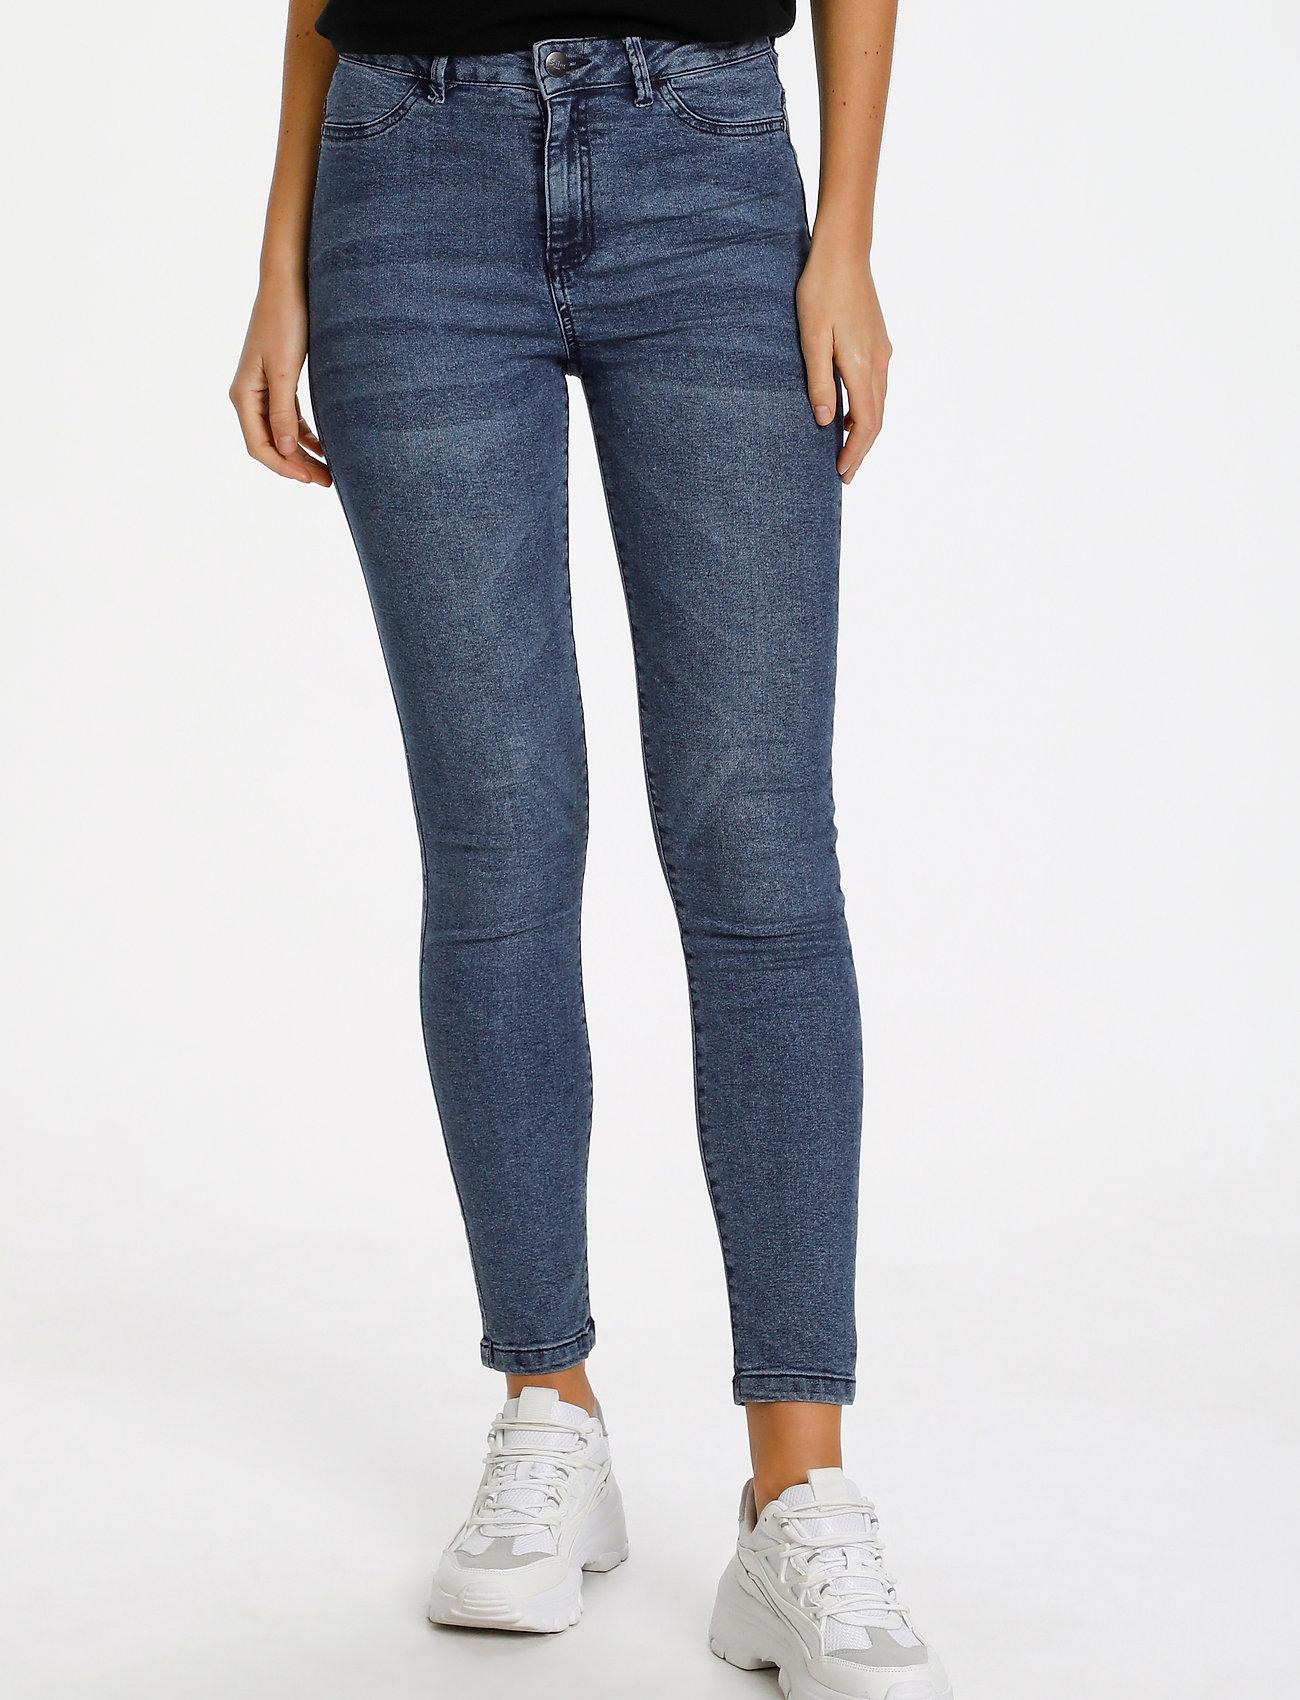 Saint Tropez - T5757, TinnaSZ Jeans - skinny jeans - med.blue - 0